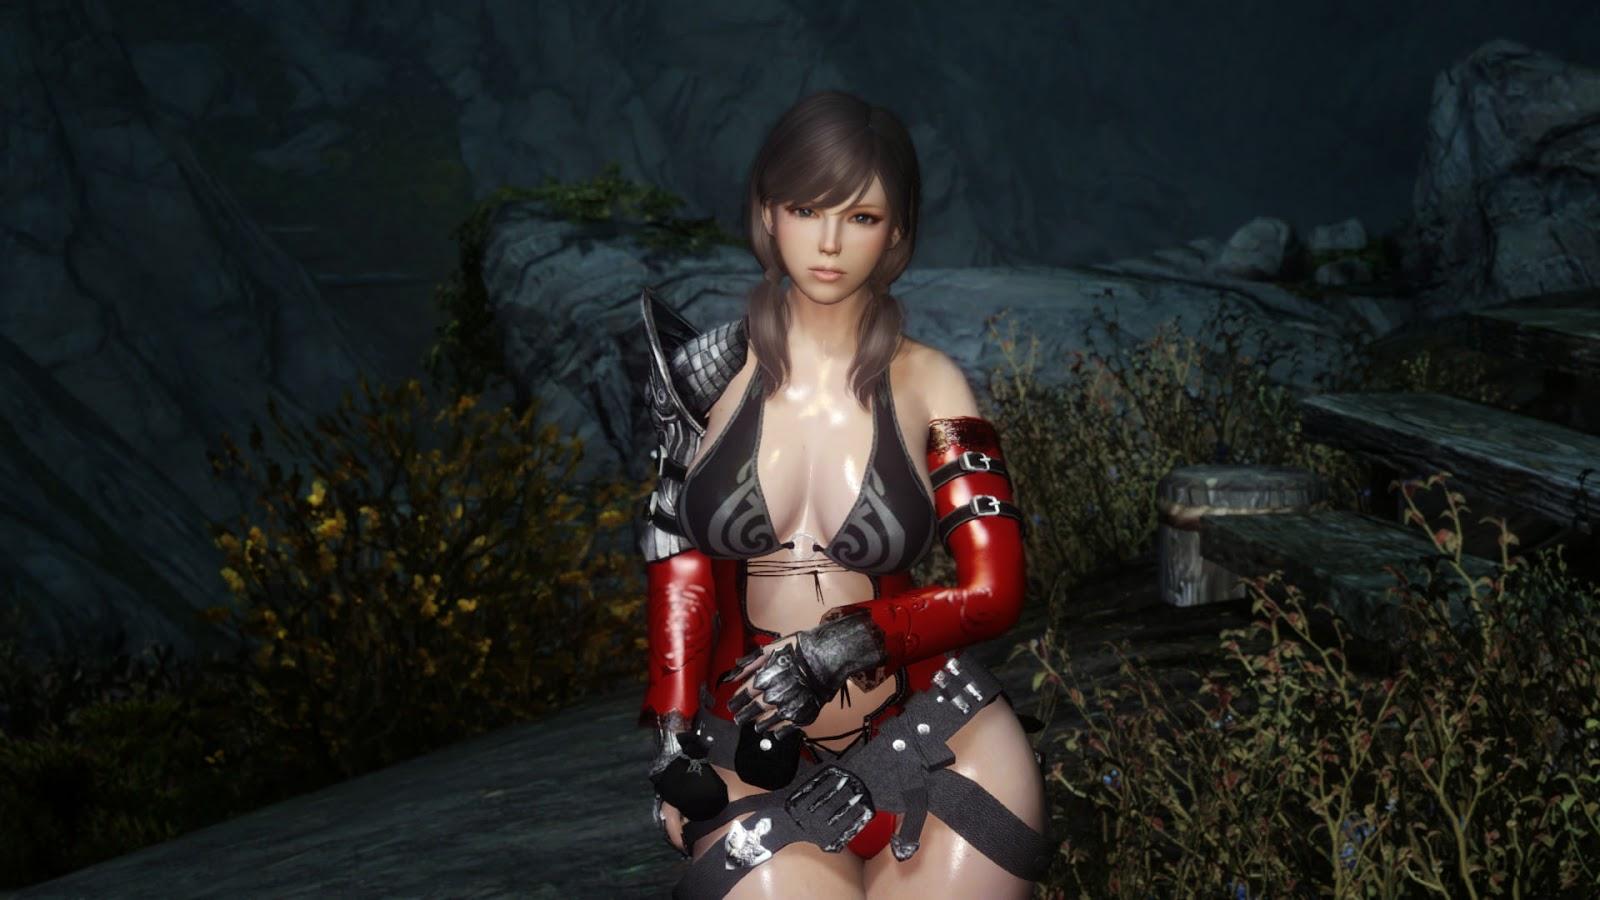 Oblivion nude mod uncensored fucked pics